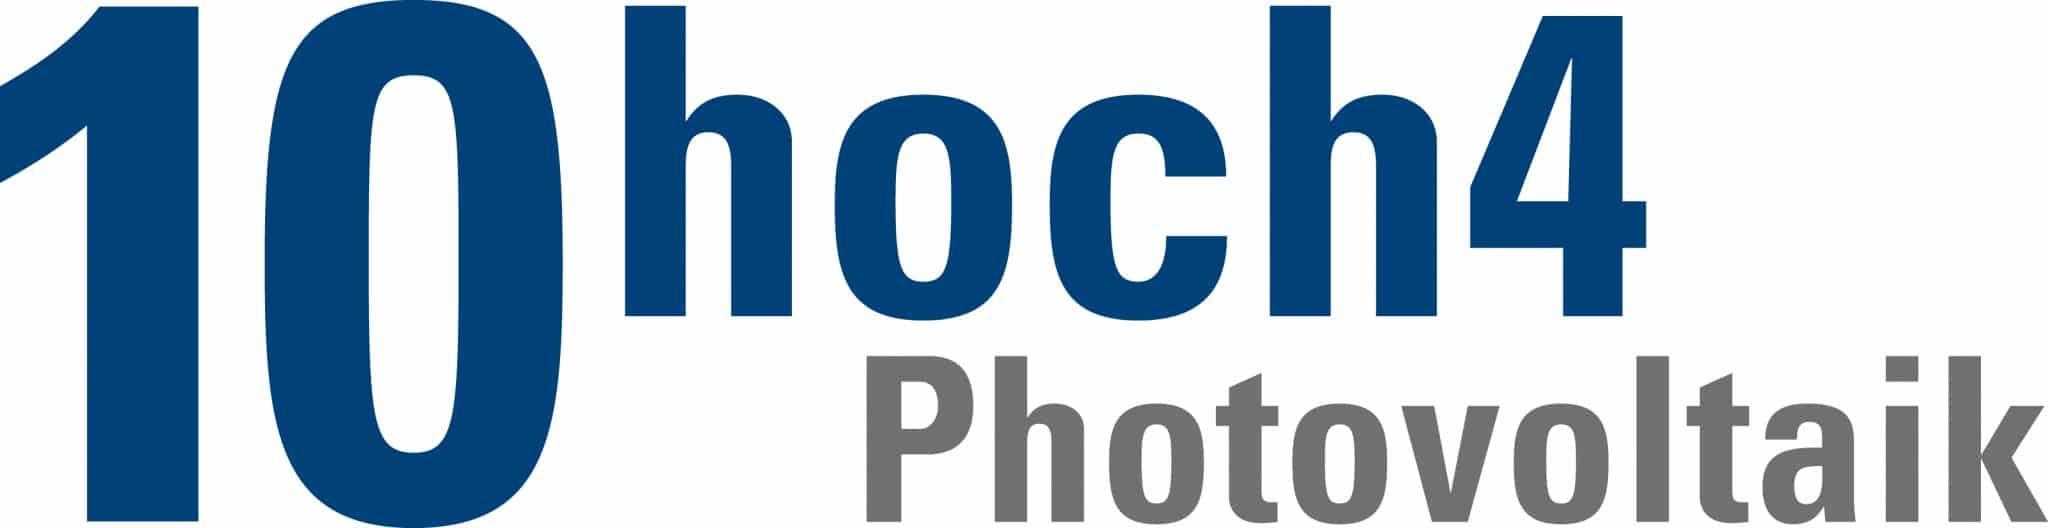 Logo 10hoch4 Photovoltaik